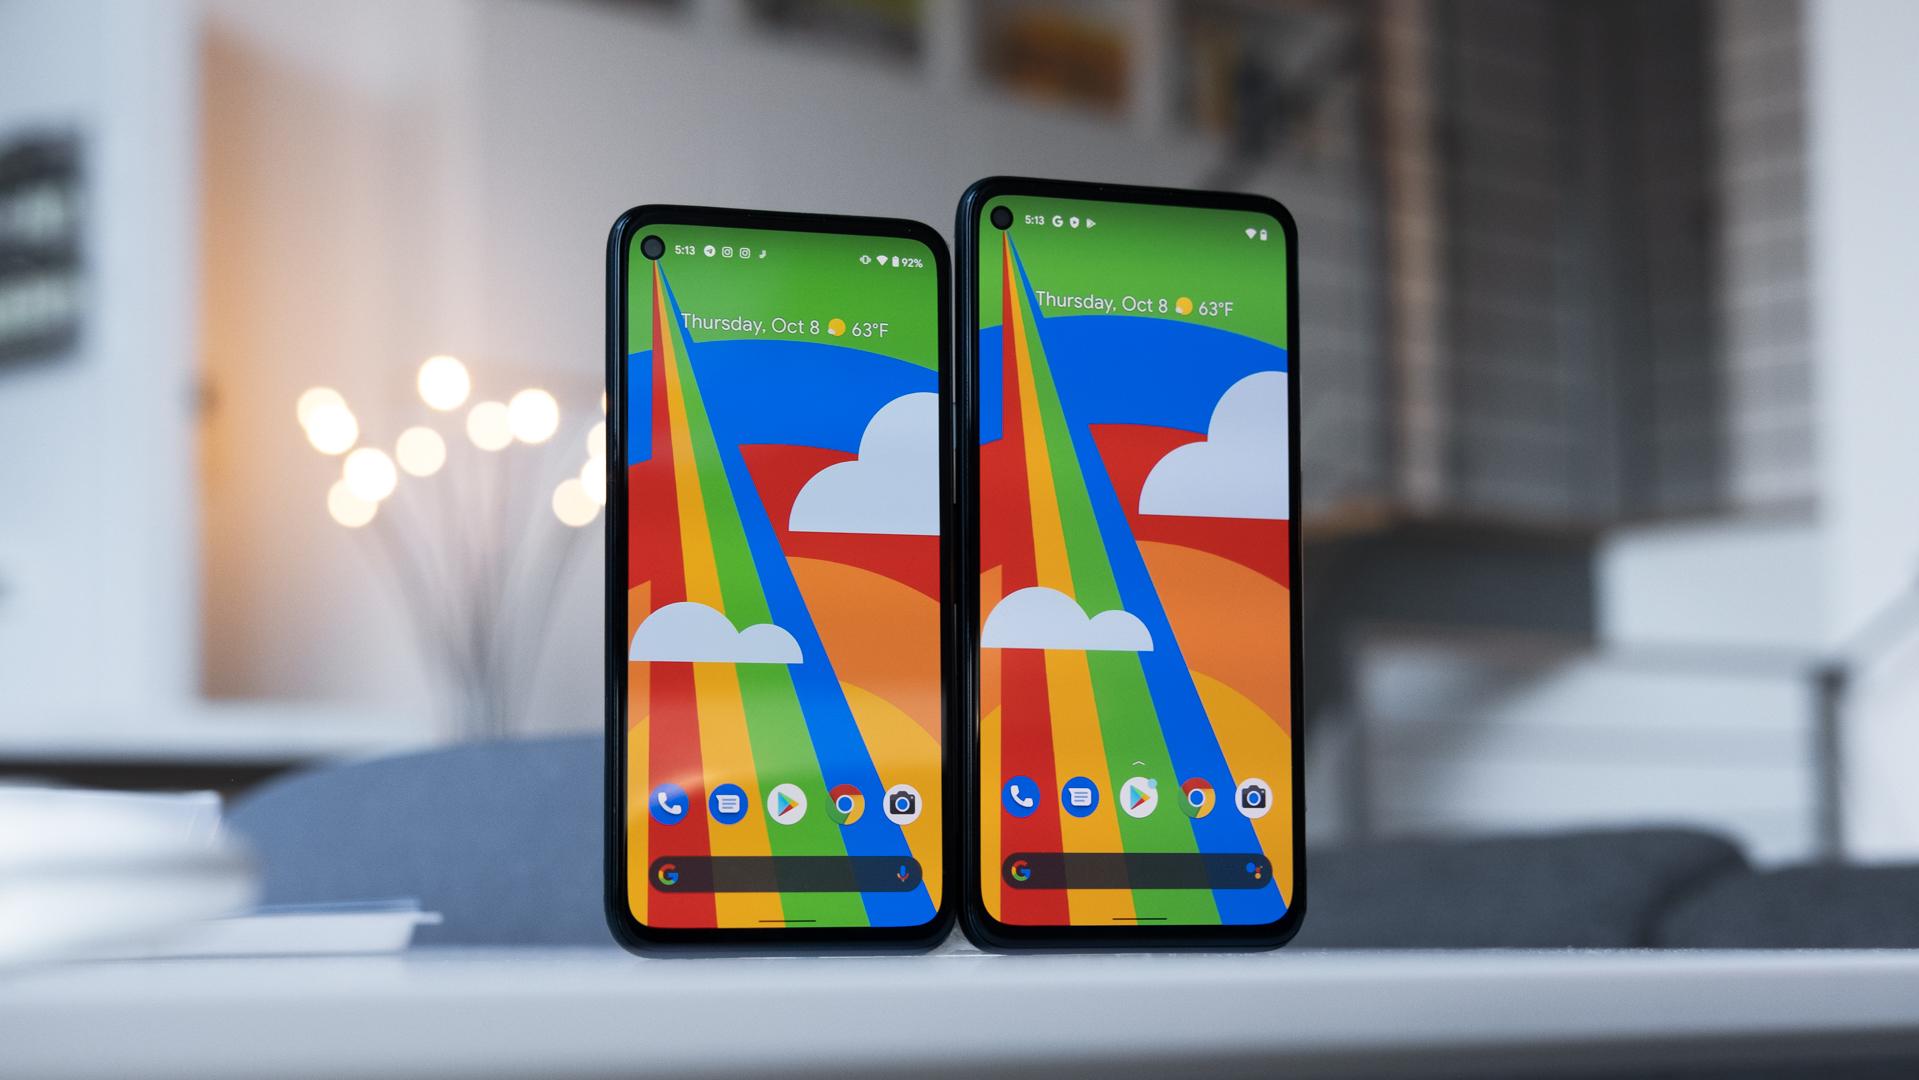 Google Pixel 4a 5G screen size comparison vs Pixel 4a